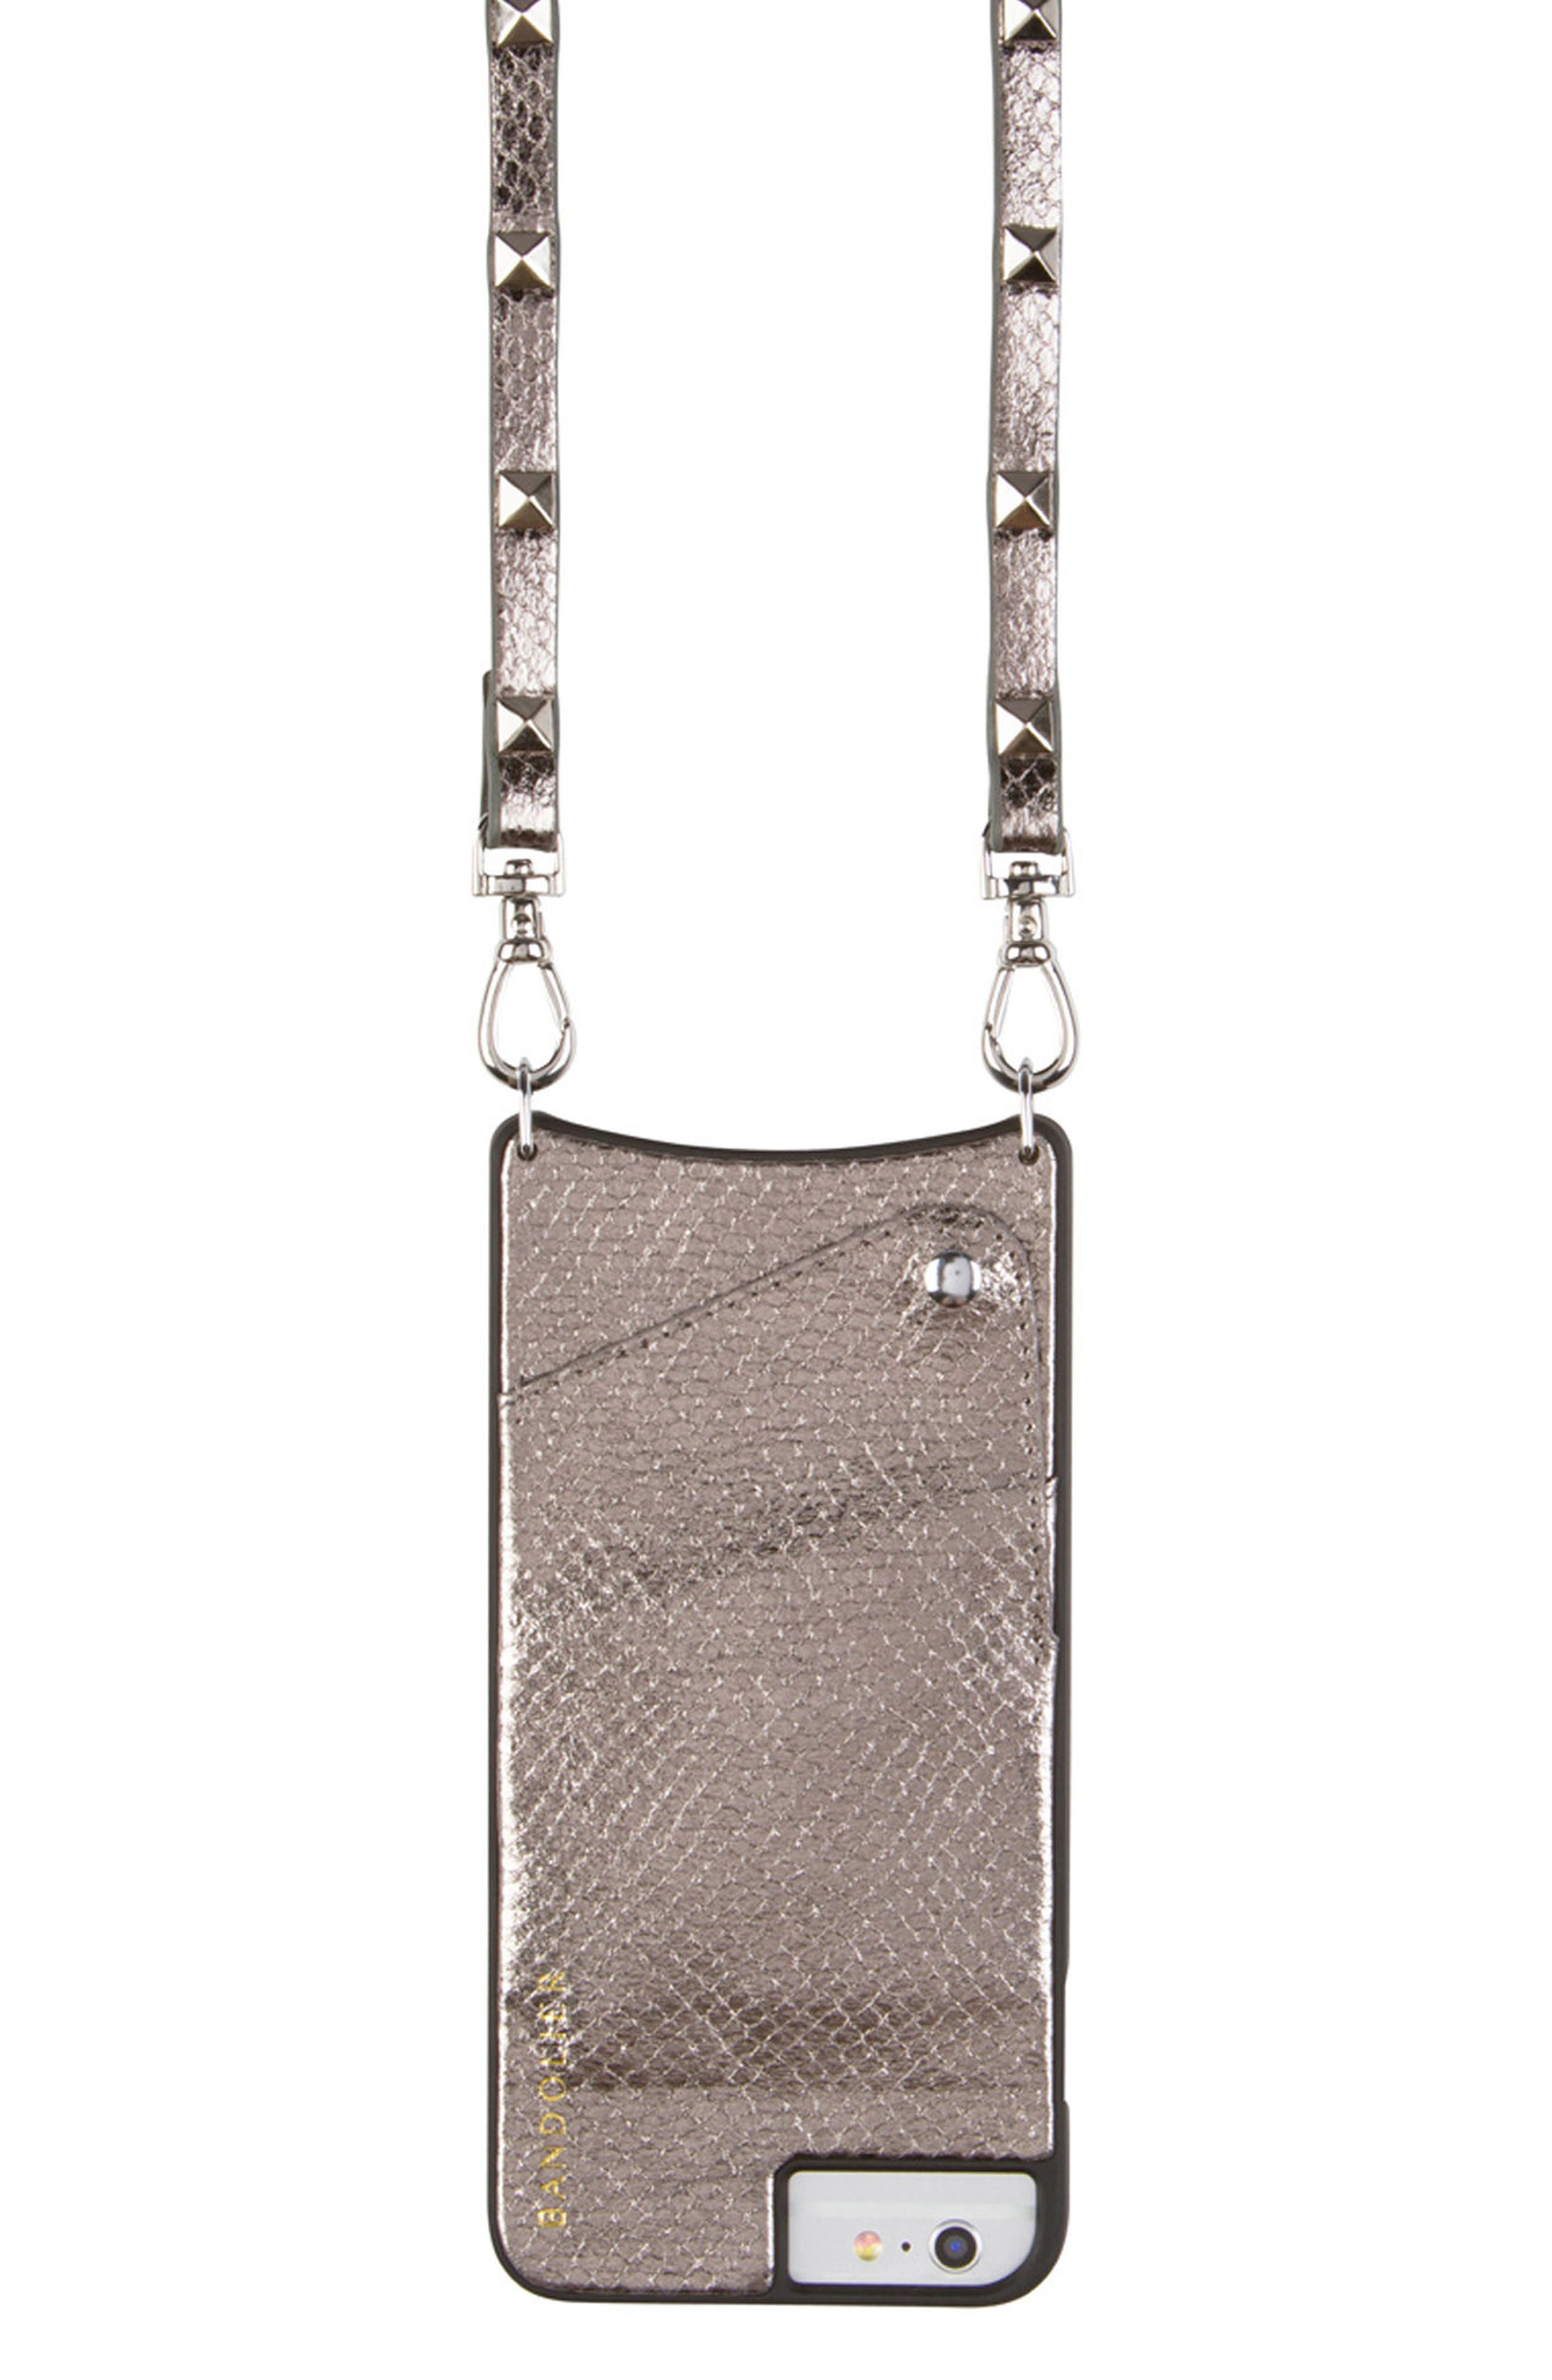 Sarah Metallic Faux Snakeskin iPhone 6/7/8 & 6/7/8 Plus Crossbody Case,                         Main,                         color, 040